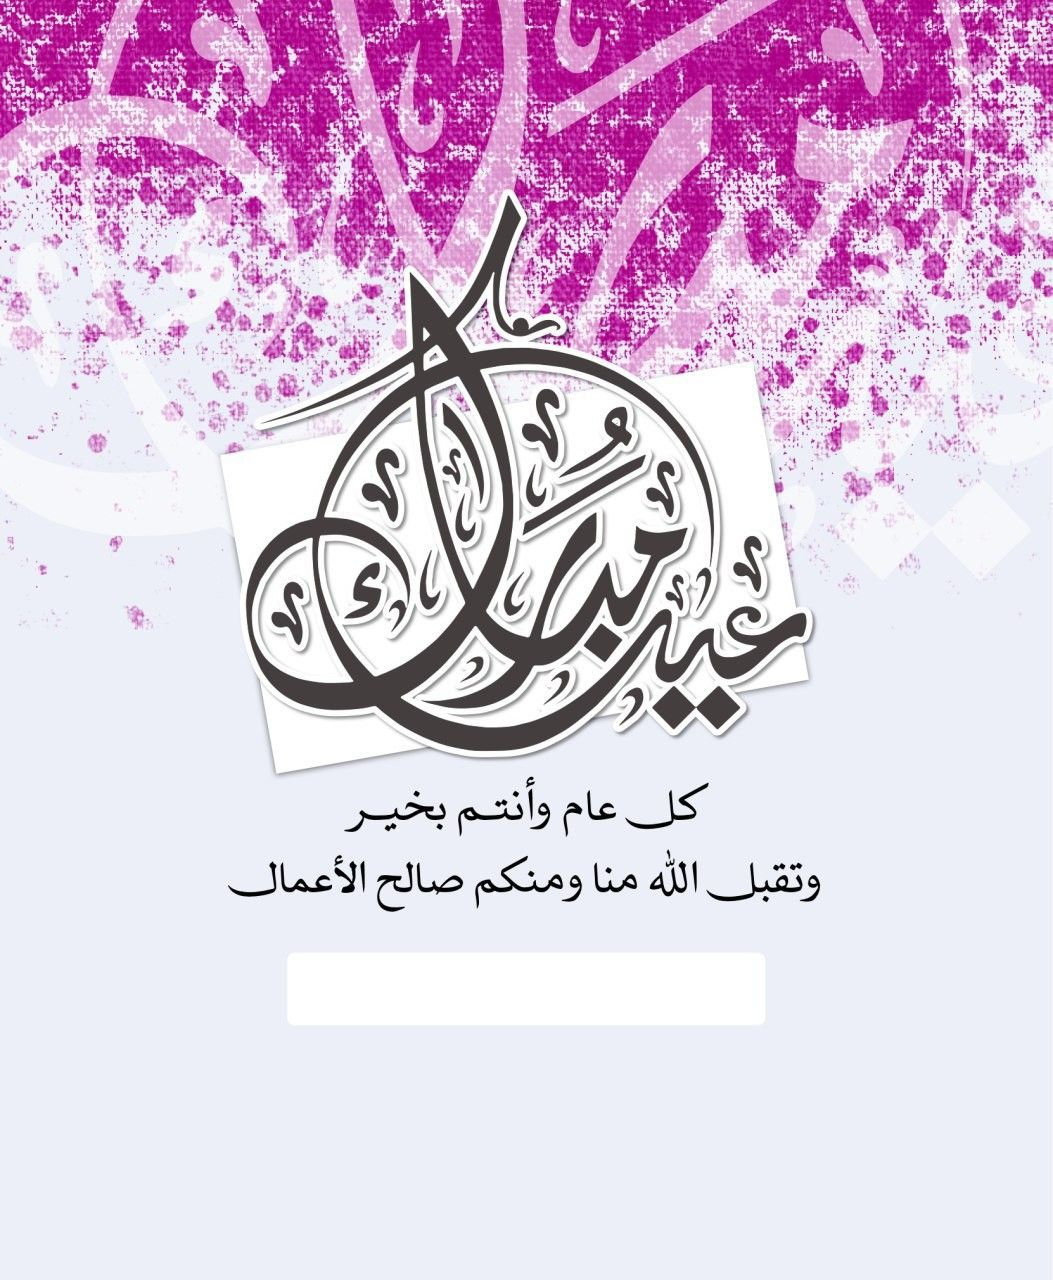 Pin By Gulnaz Mulla On بطاقات تصميم للعيد In 2020 Eid Wallpaper Eid Crafts Birthday Girl Quotes